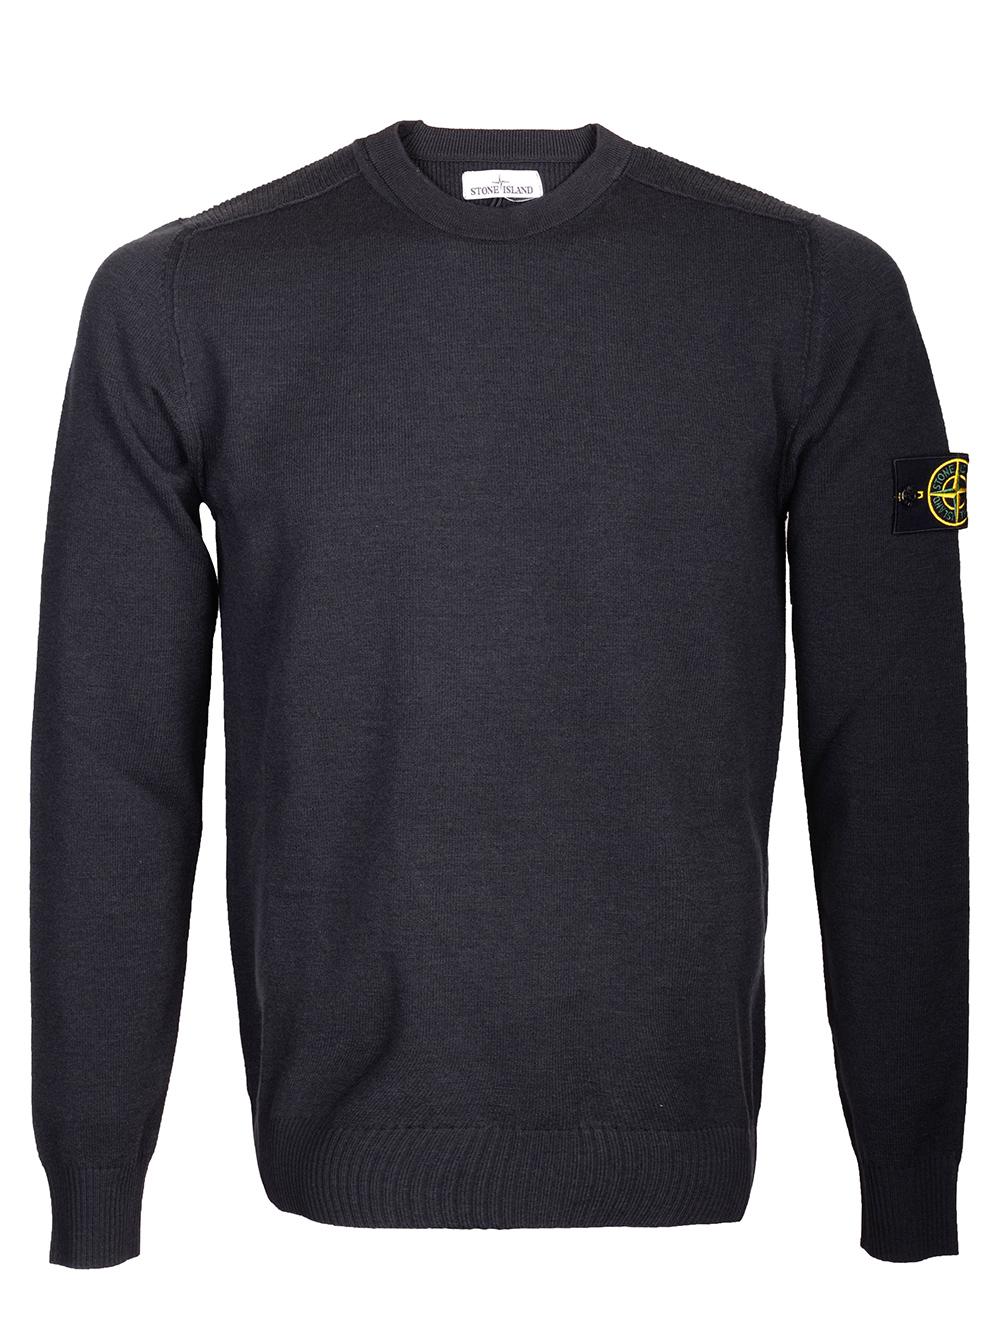 STONE ISLAND Μπλούζα πουλόβερ 7115591A1 ΧΑΚΙ